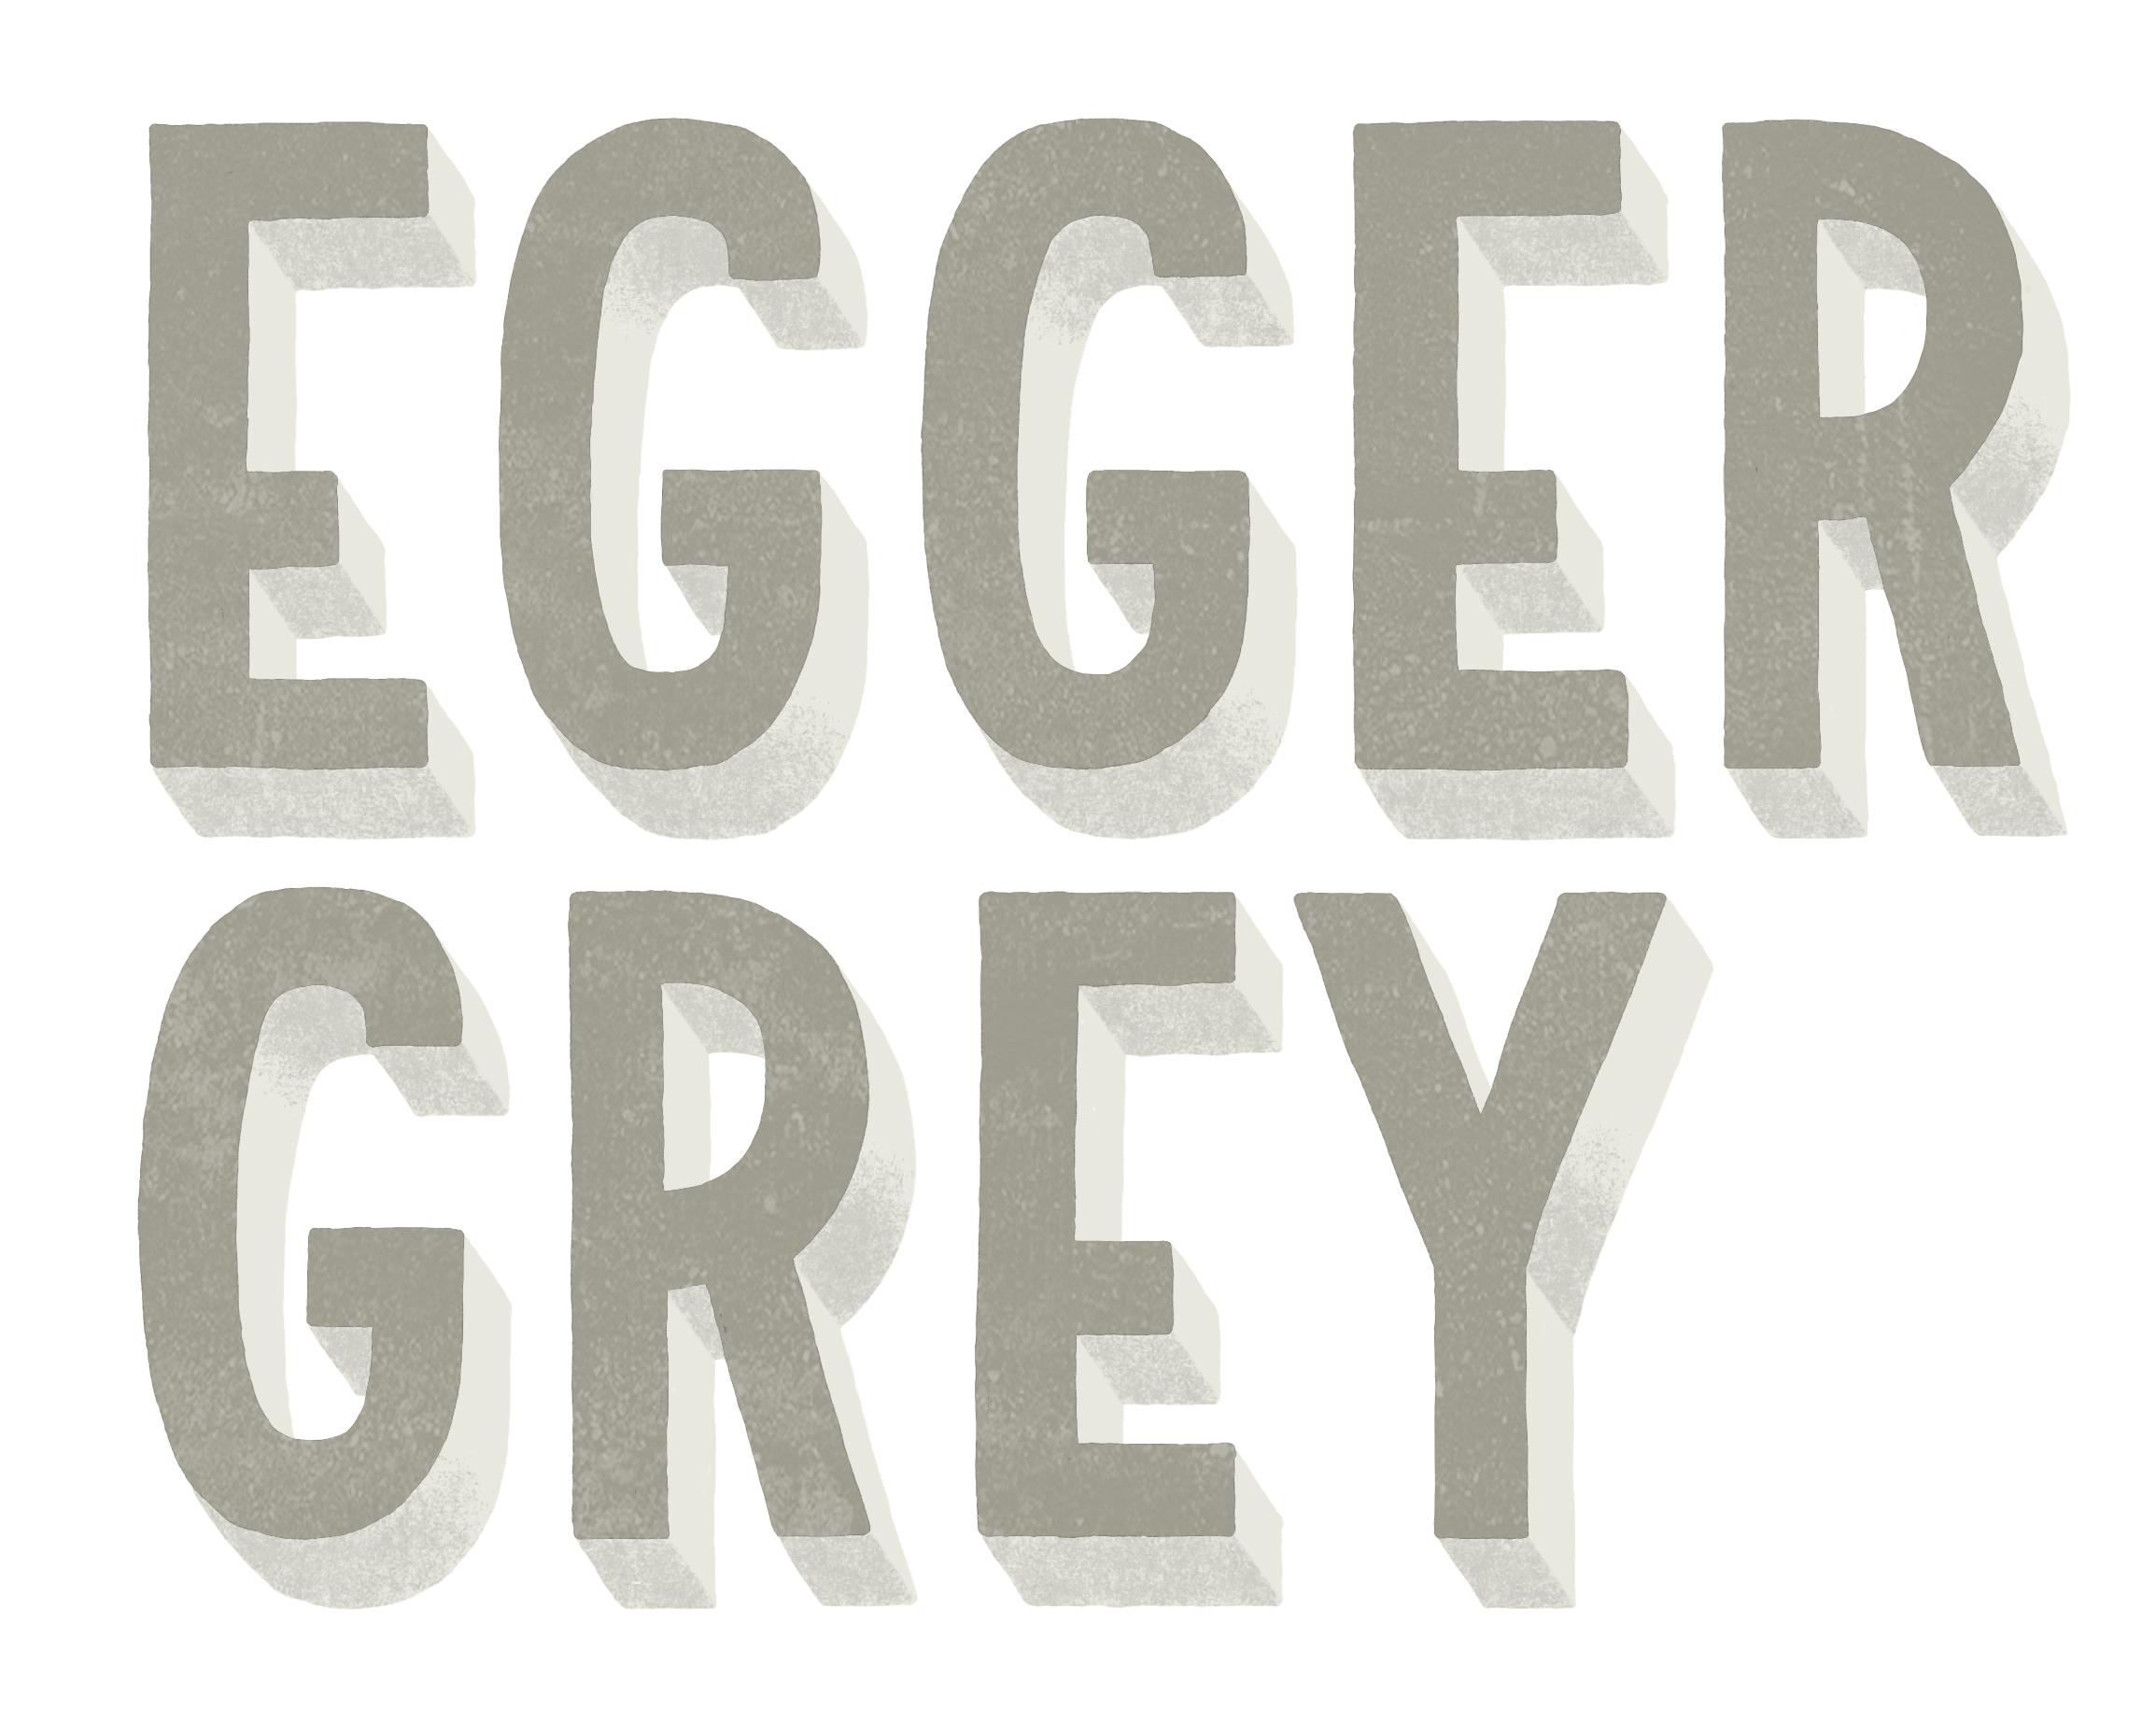 Egger Grey Artist Management